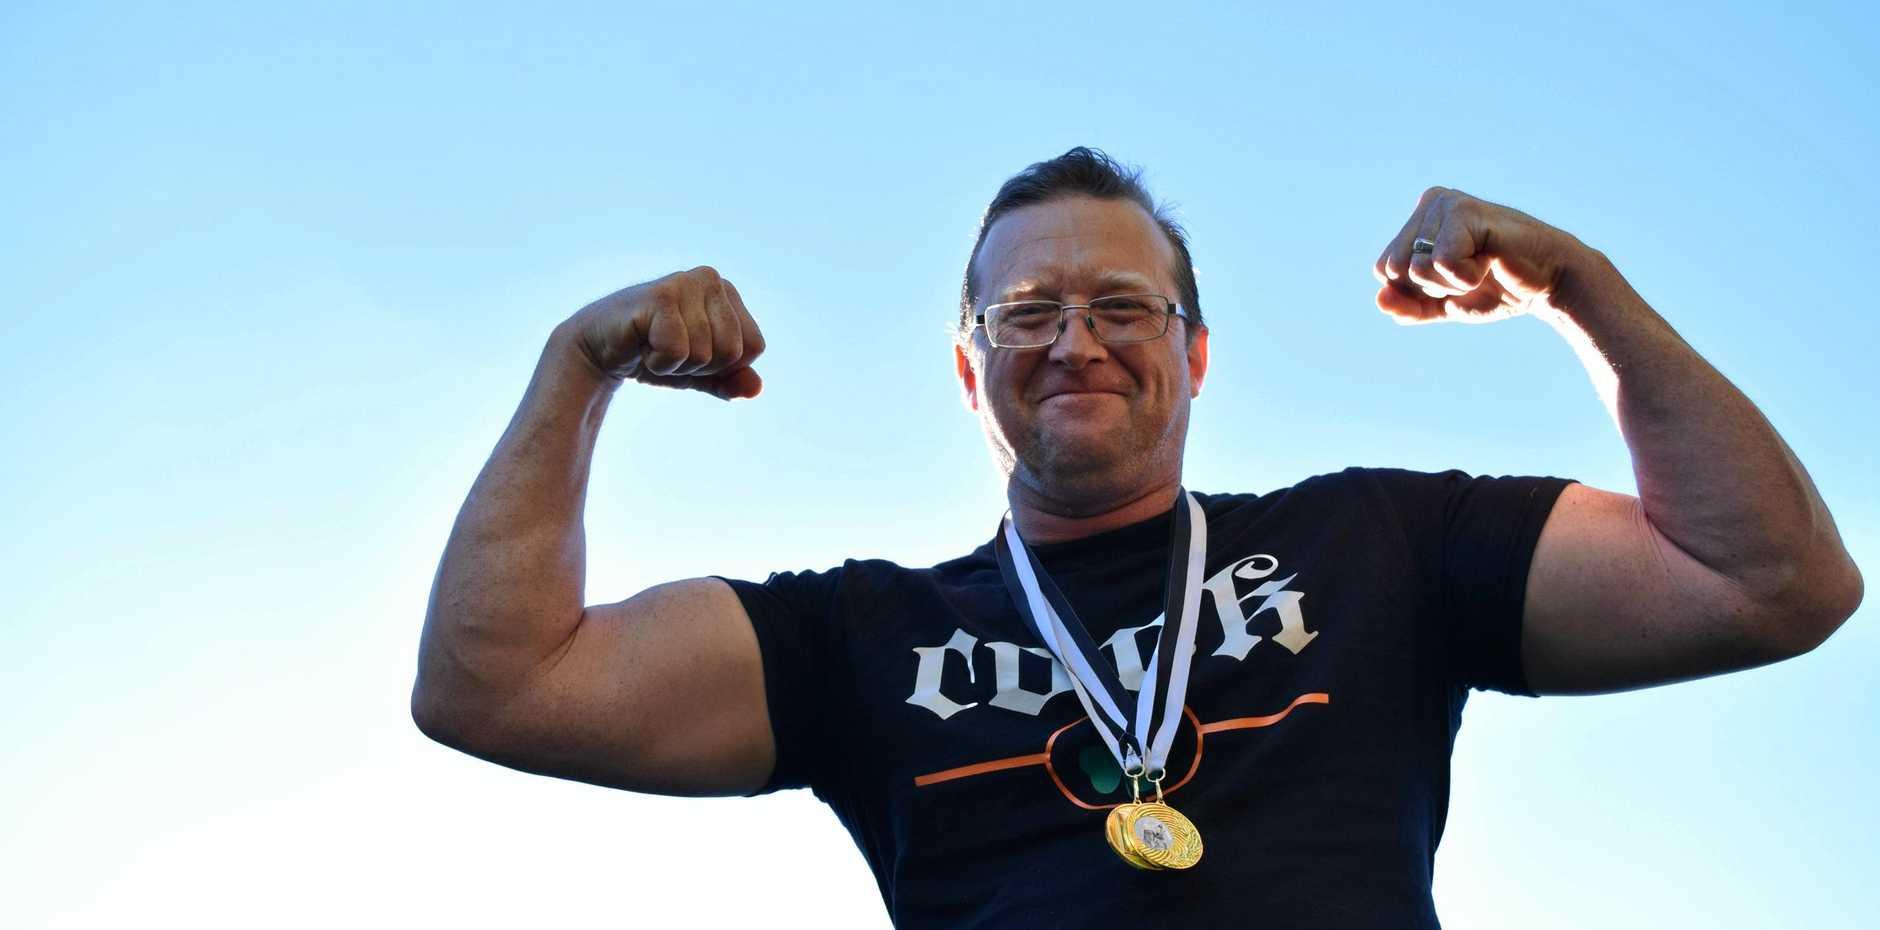 Warwick strongman Paul Driscoll won gold at the Australian Celtic Festival Highland Games in Glen Innes on Saturday.